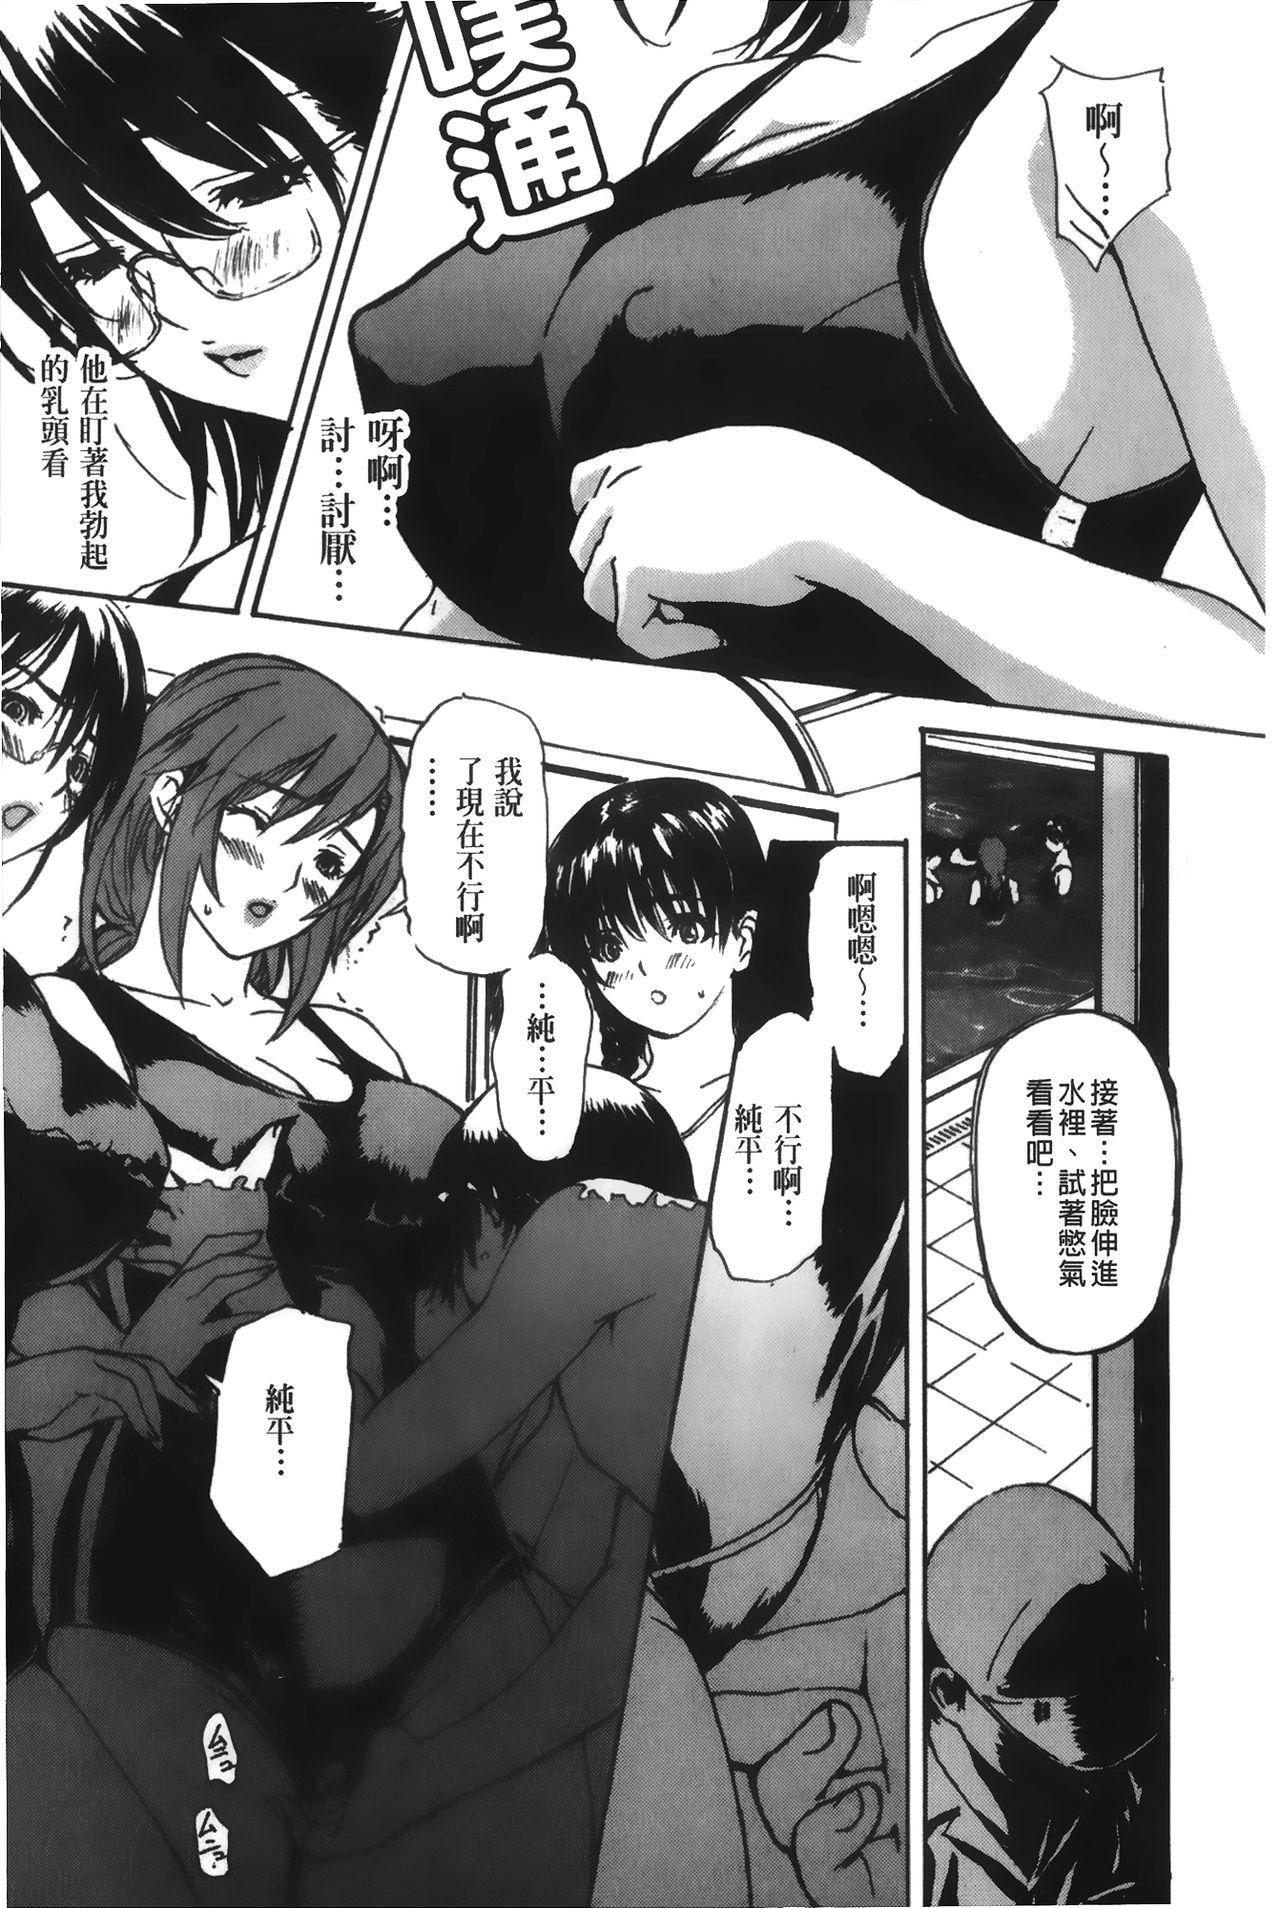 Tonari no Minano Sensei 4 | 隔壁的美奈乃老師 4 13